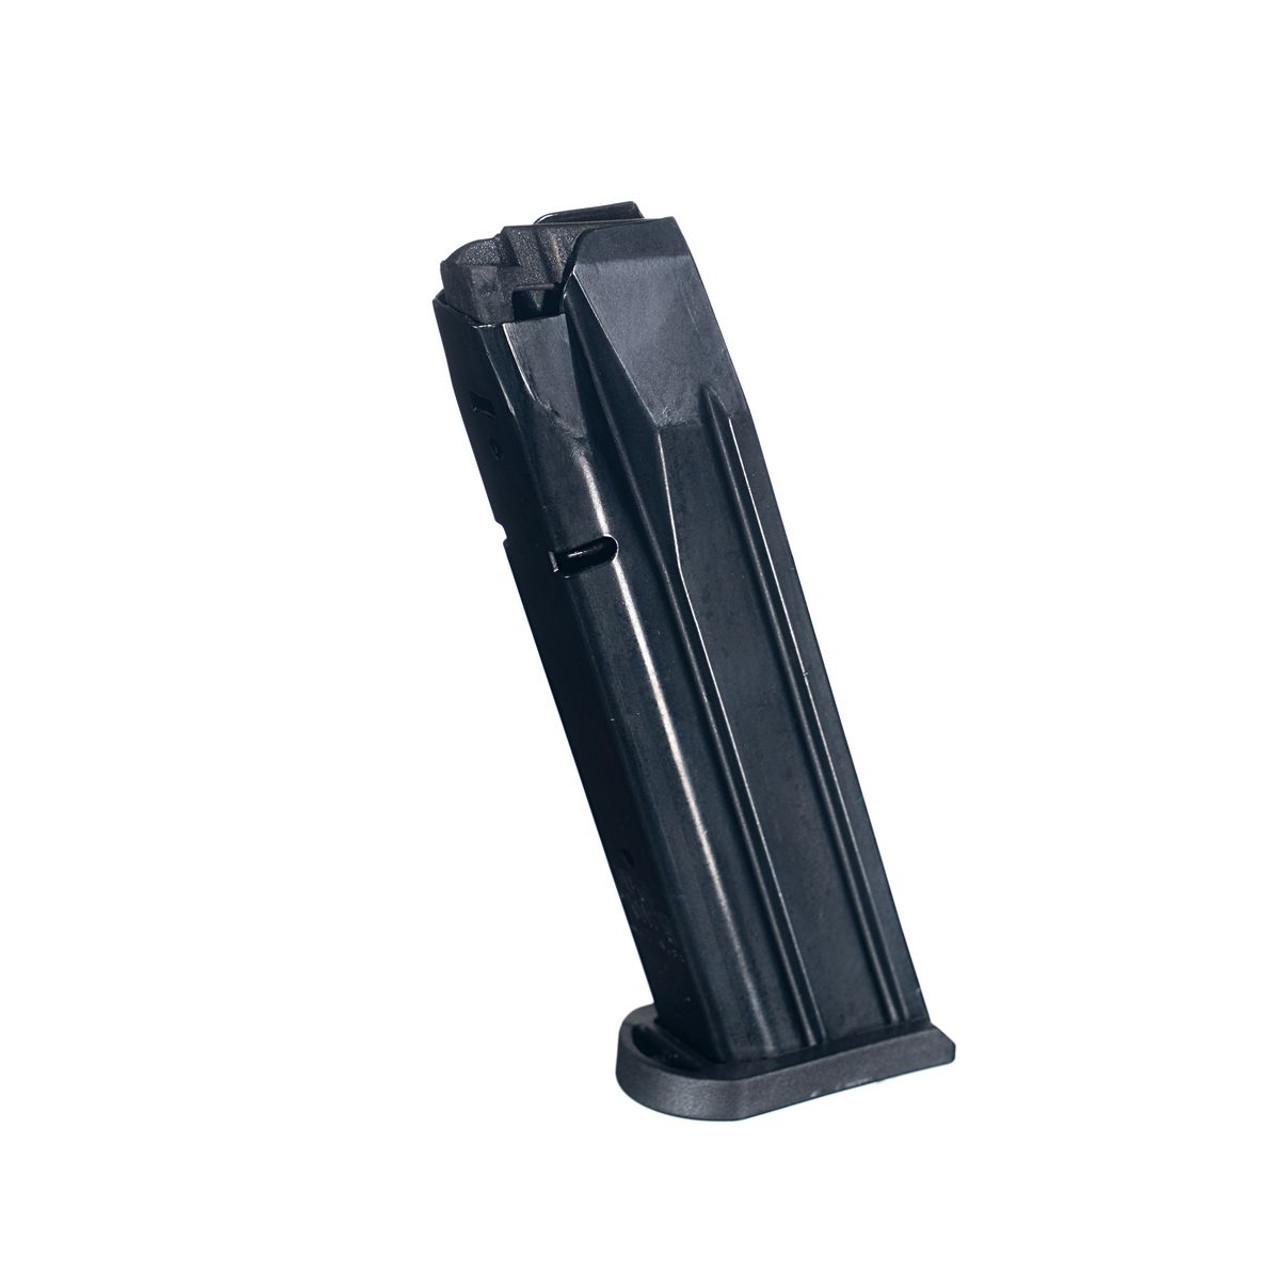 CZ® P10-C 9mm (15) Rd - Blue Steel